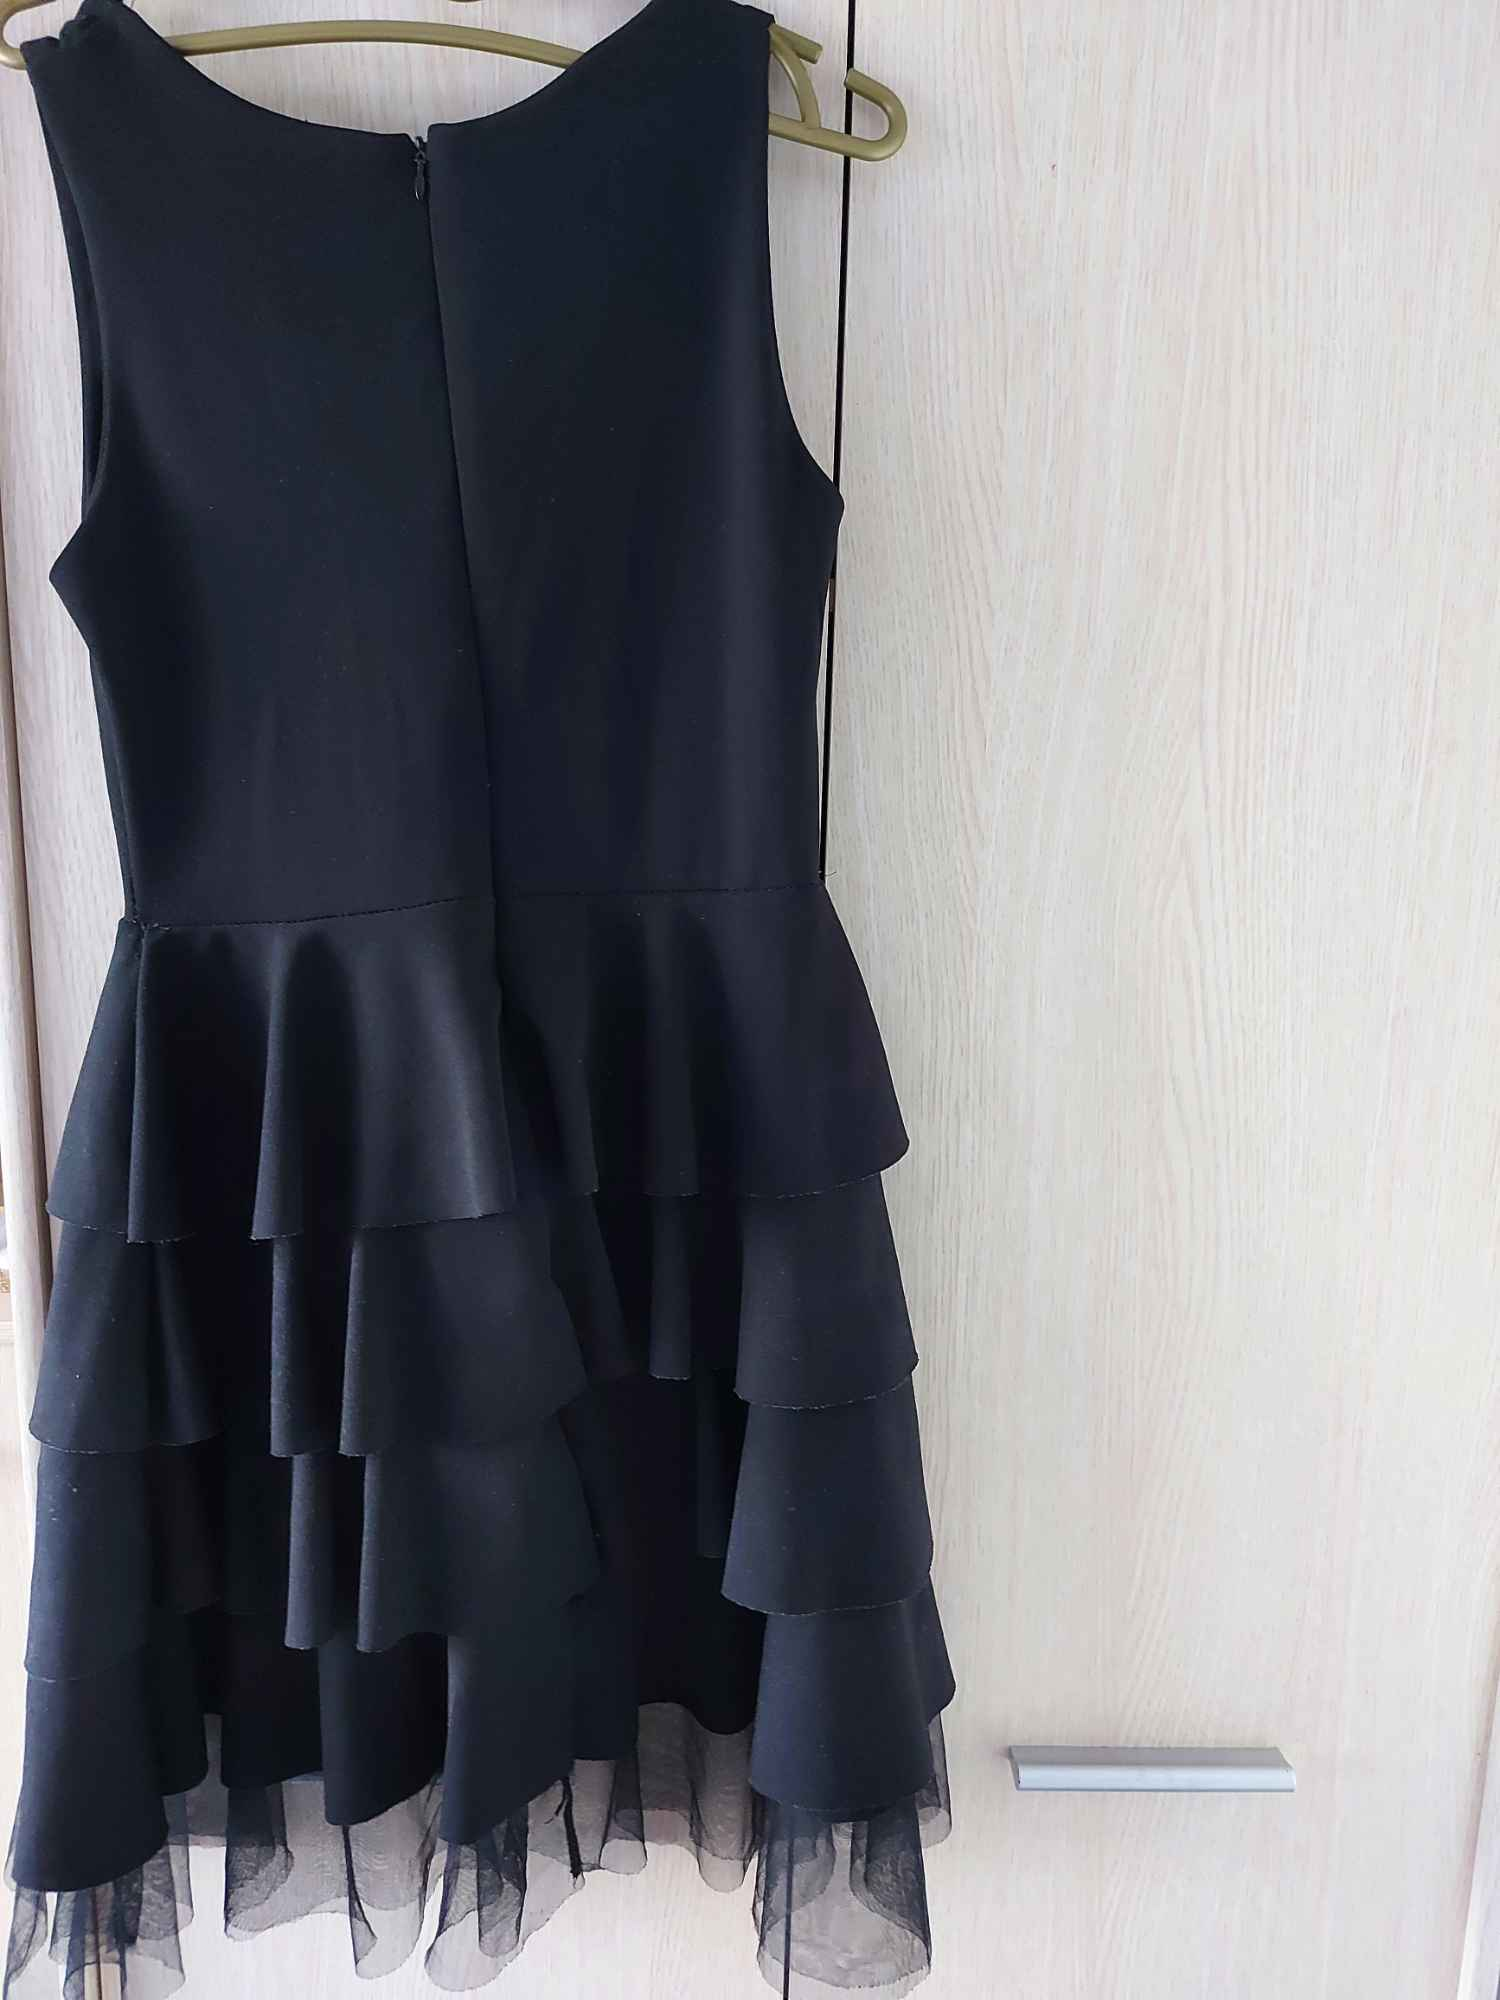 Sukienka czarna Żuromin - zdjęcie 2